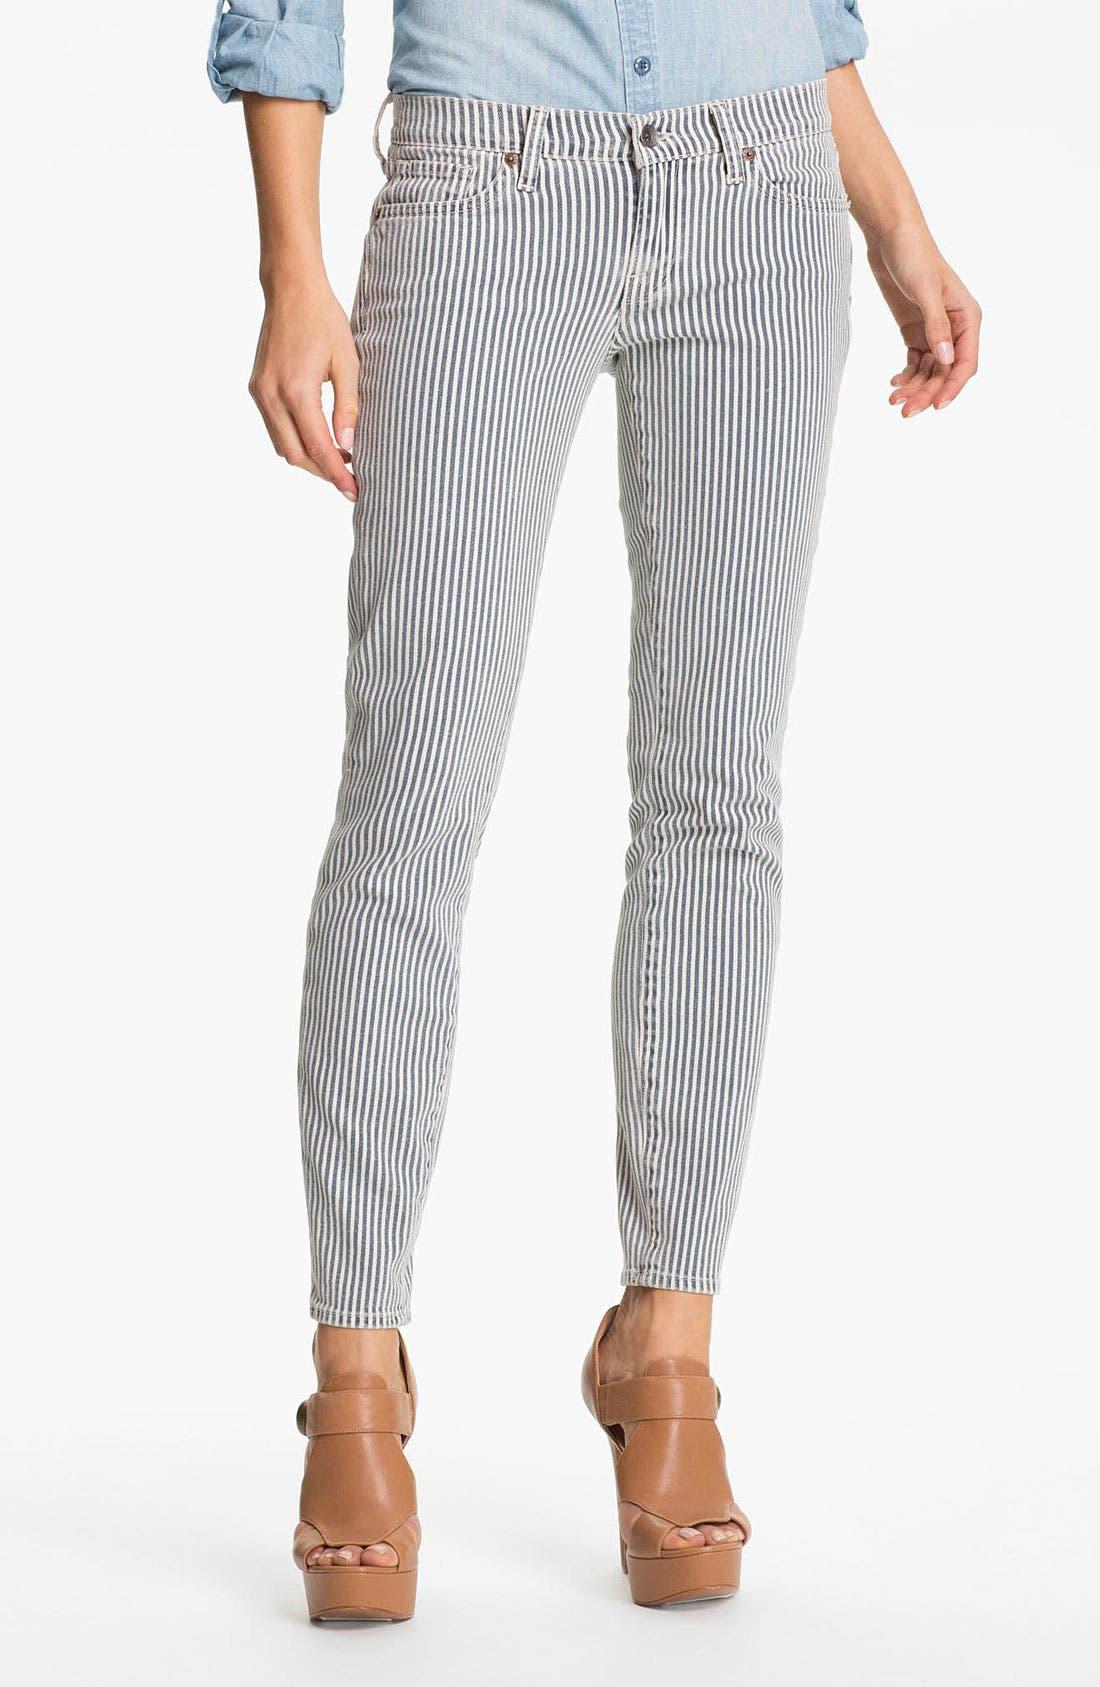 Alternate Image 1 Selected - Lucky Brand 'Charlie' Stripe Skinny Jeans